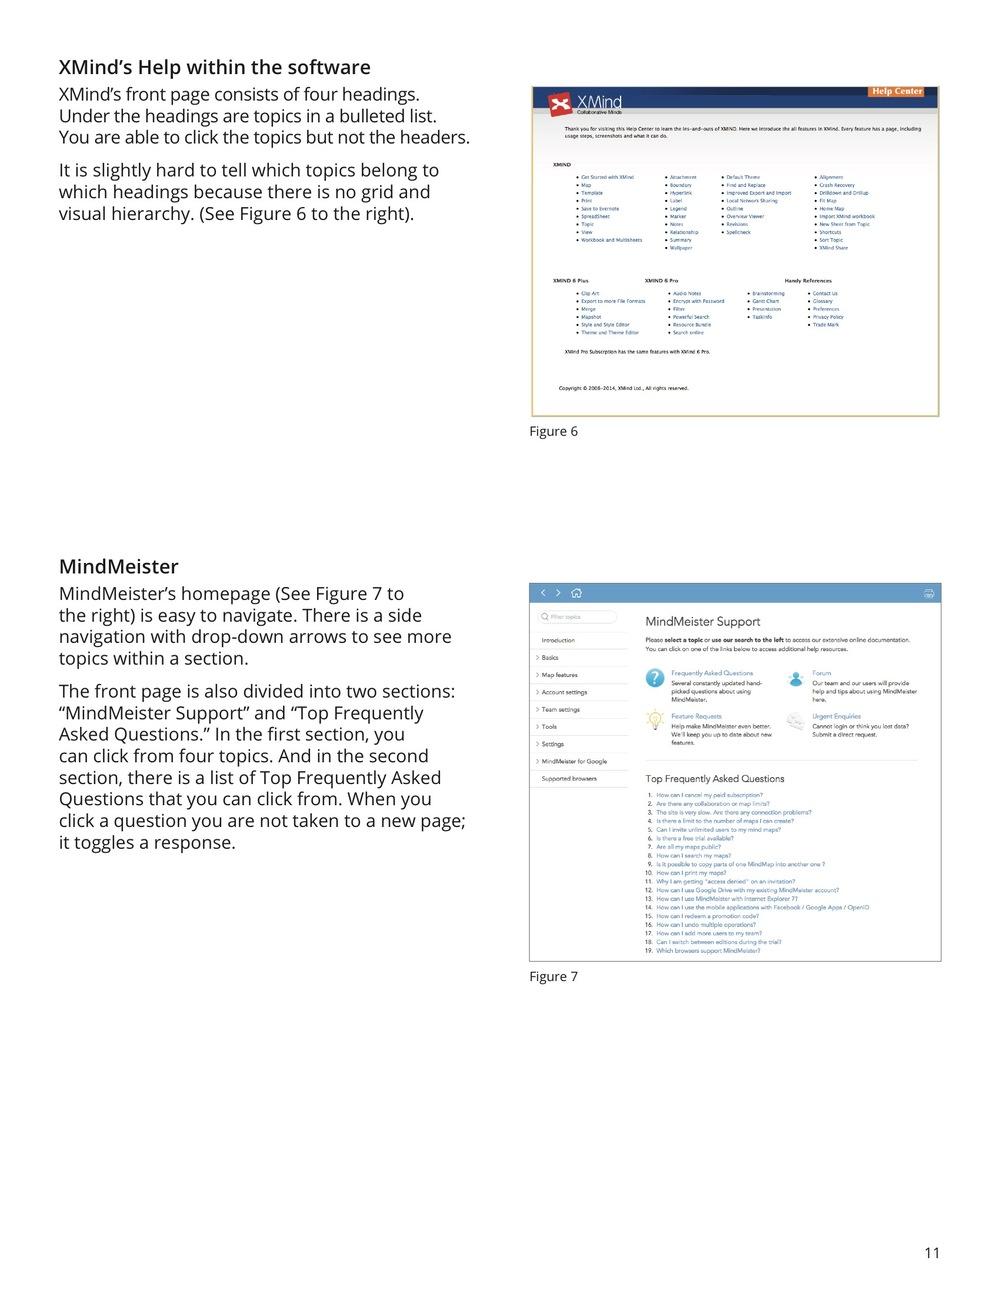 XMind Final Report_4-23-15 11-11.jpeg